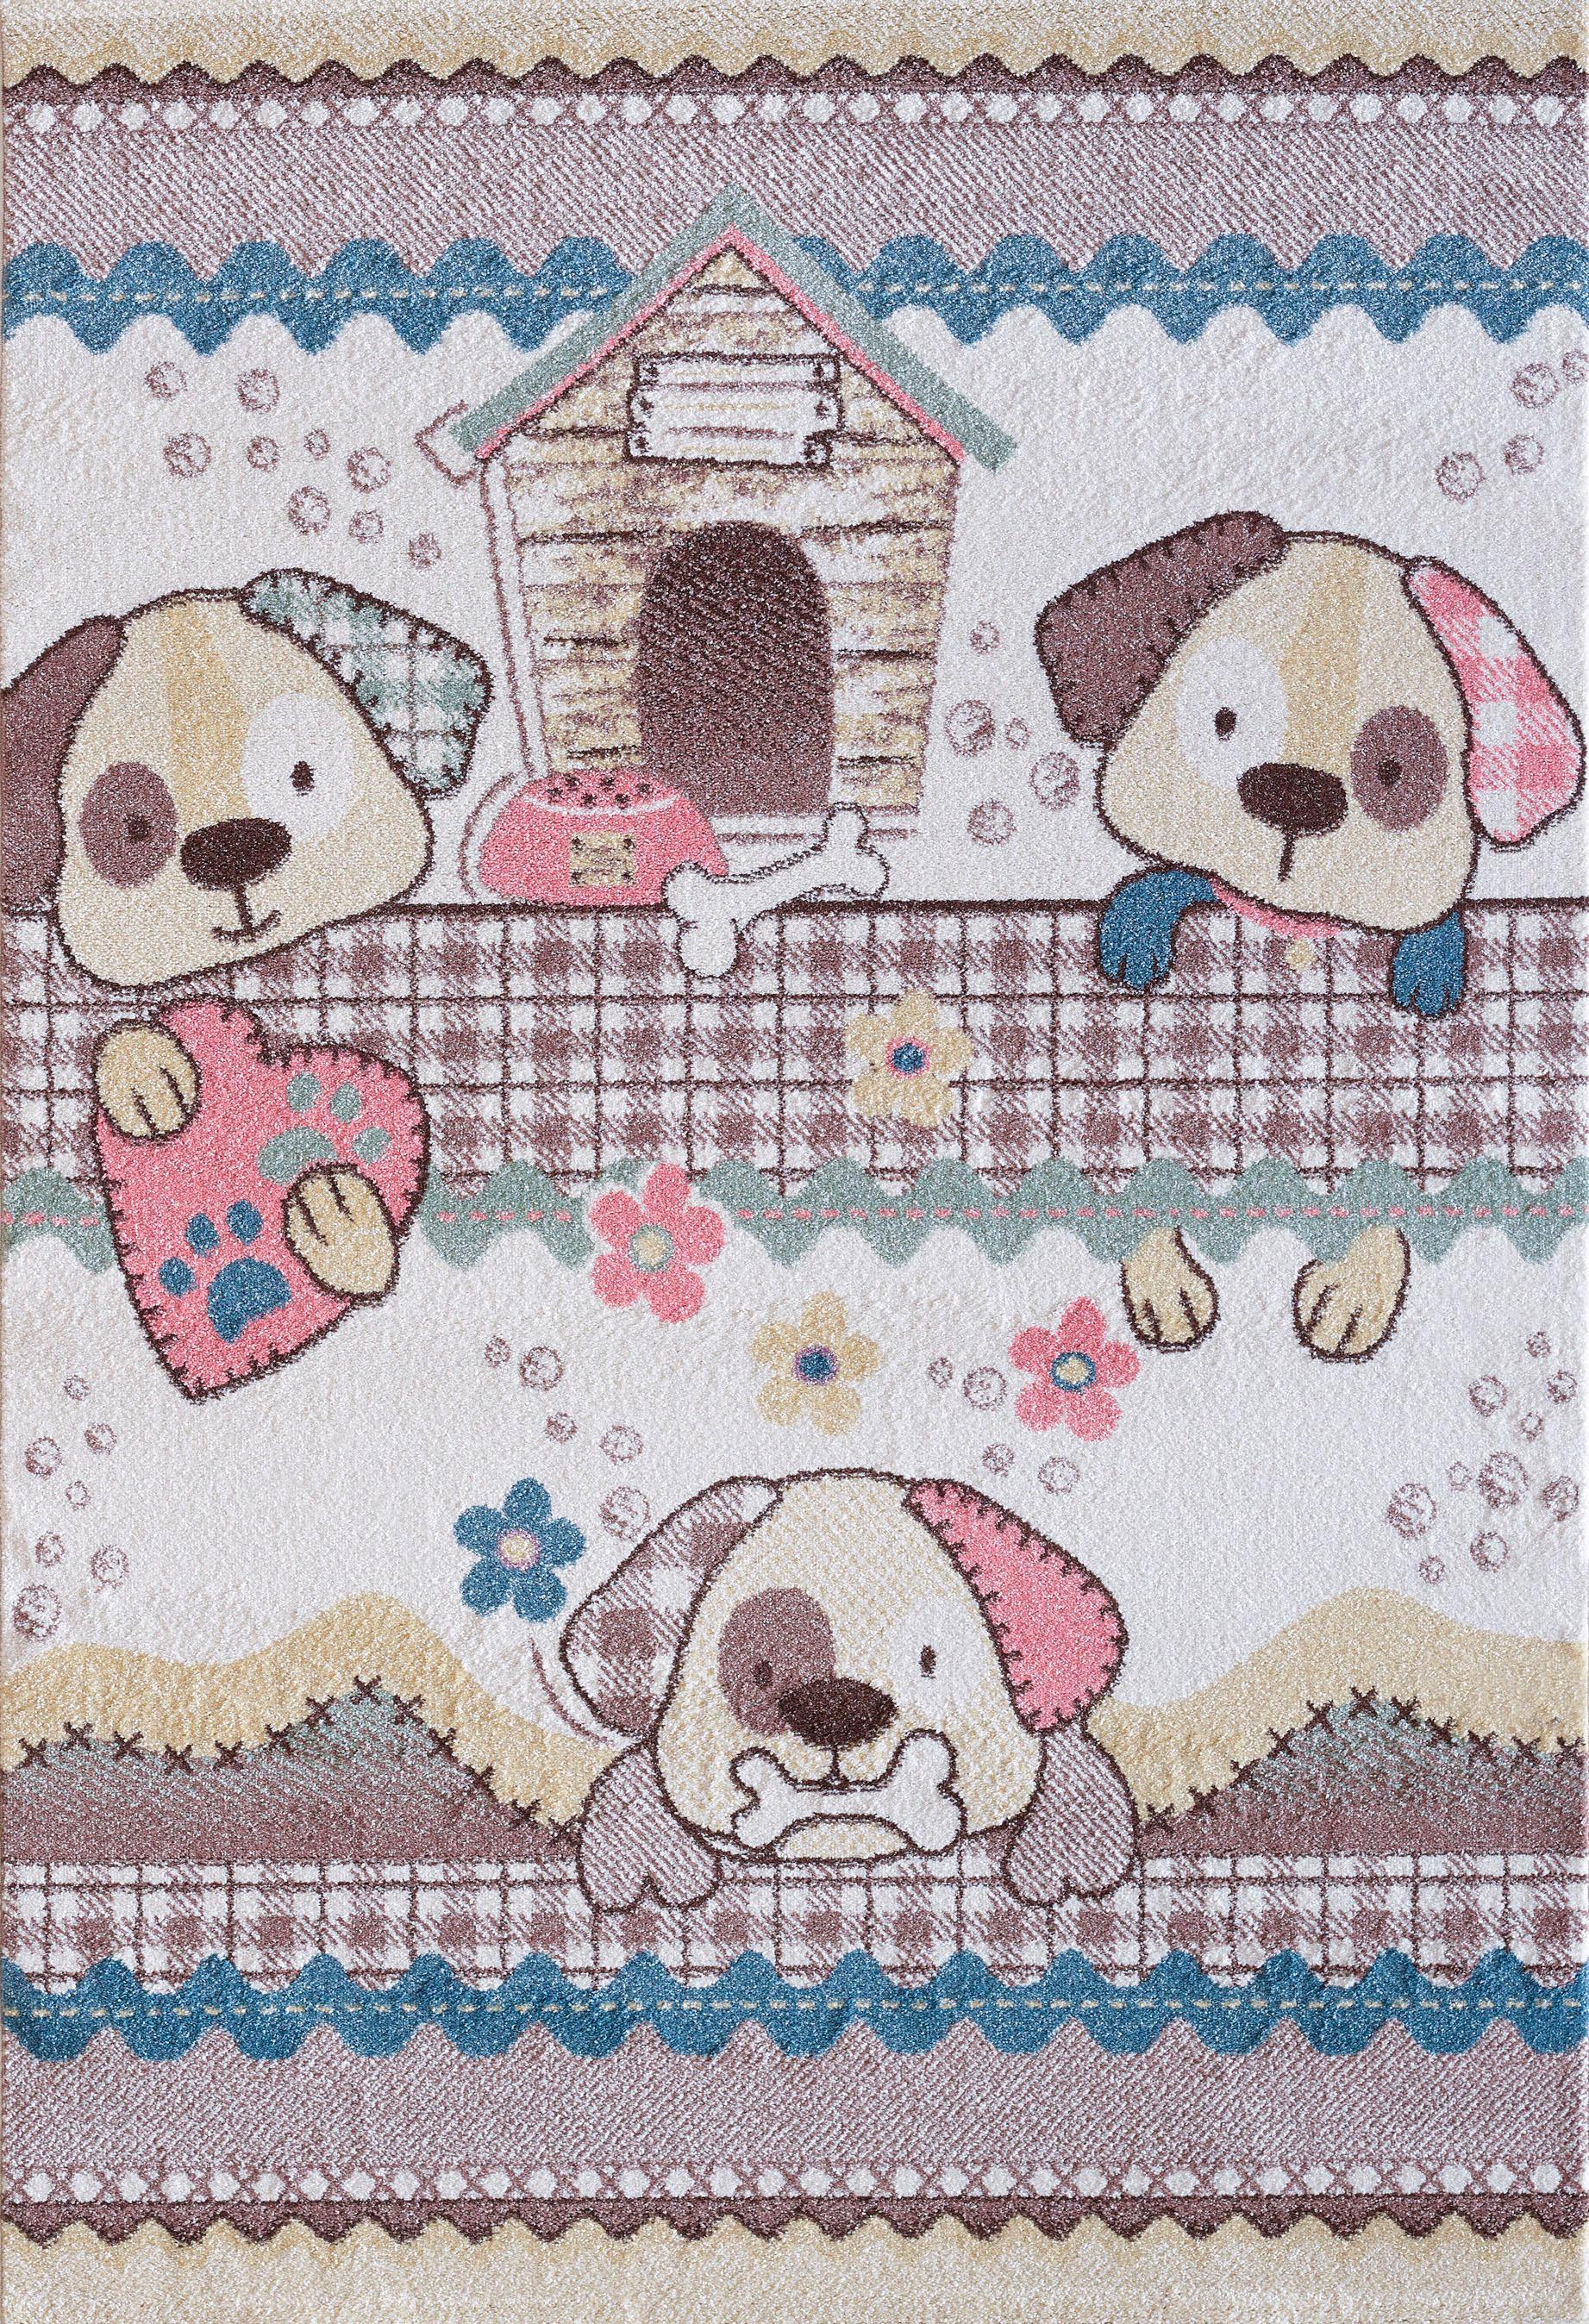 Sanat Kinderteppich Luna Kids 4603, rechteckig, 12 mm Höhe bunt Kinder Bunte Kinderteppiche Teppiche